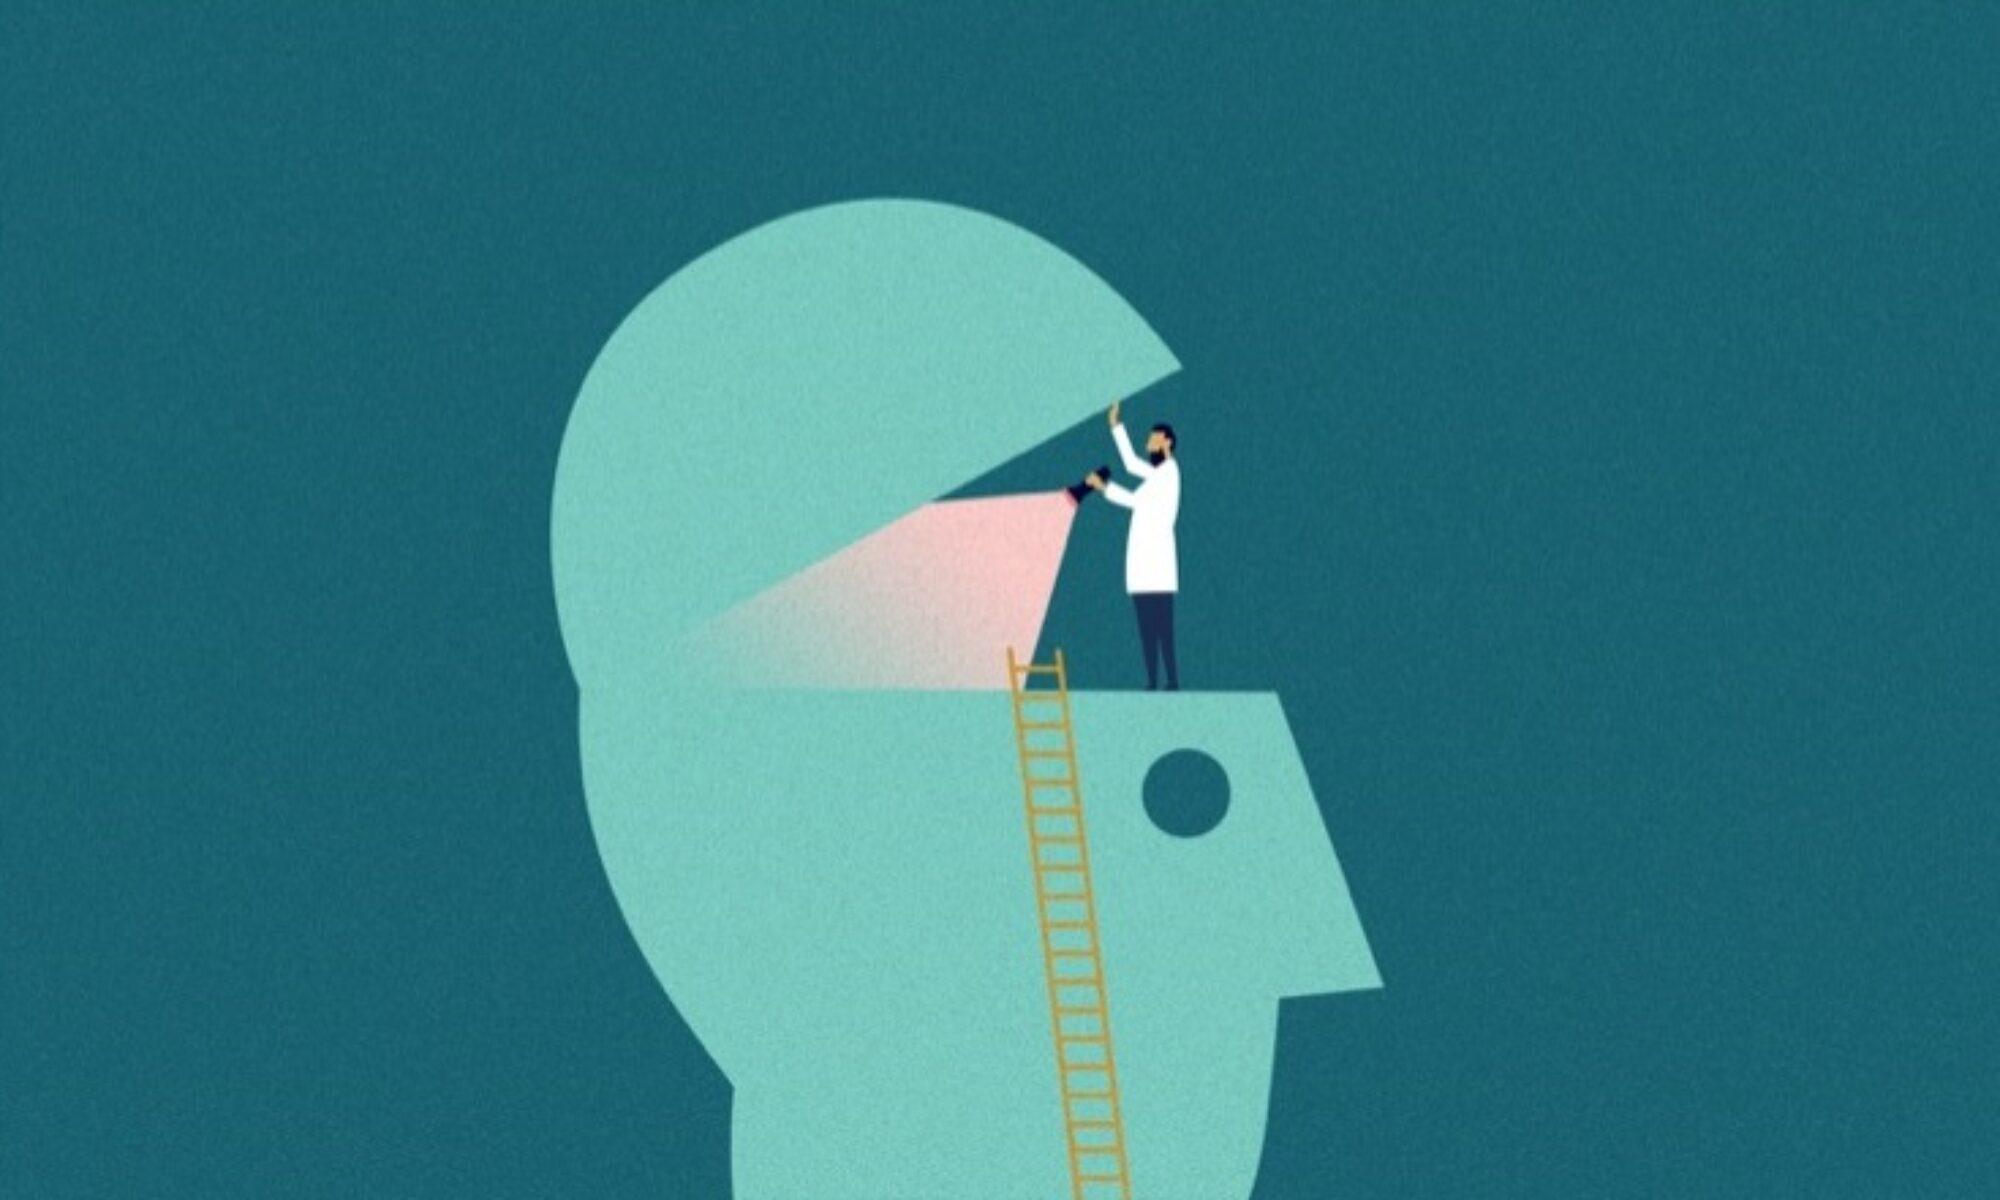 Cognitive Care